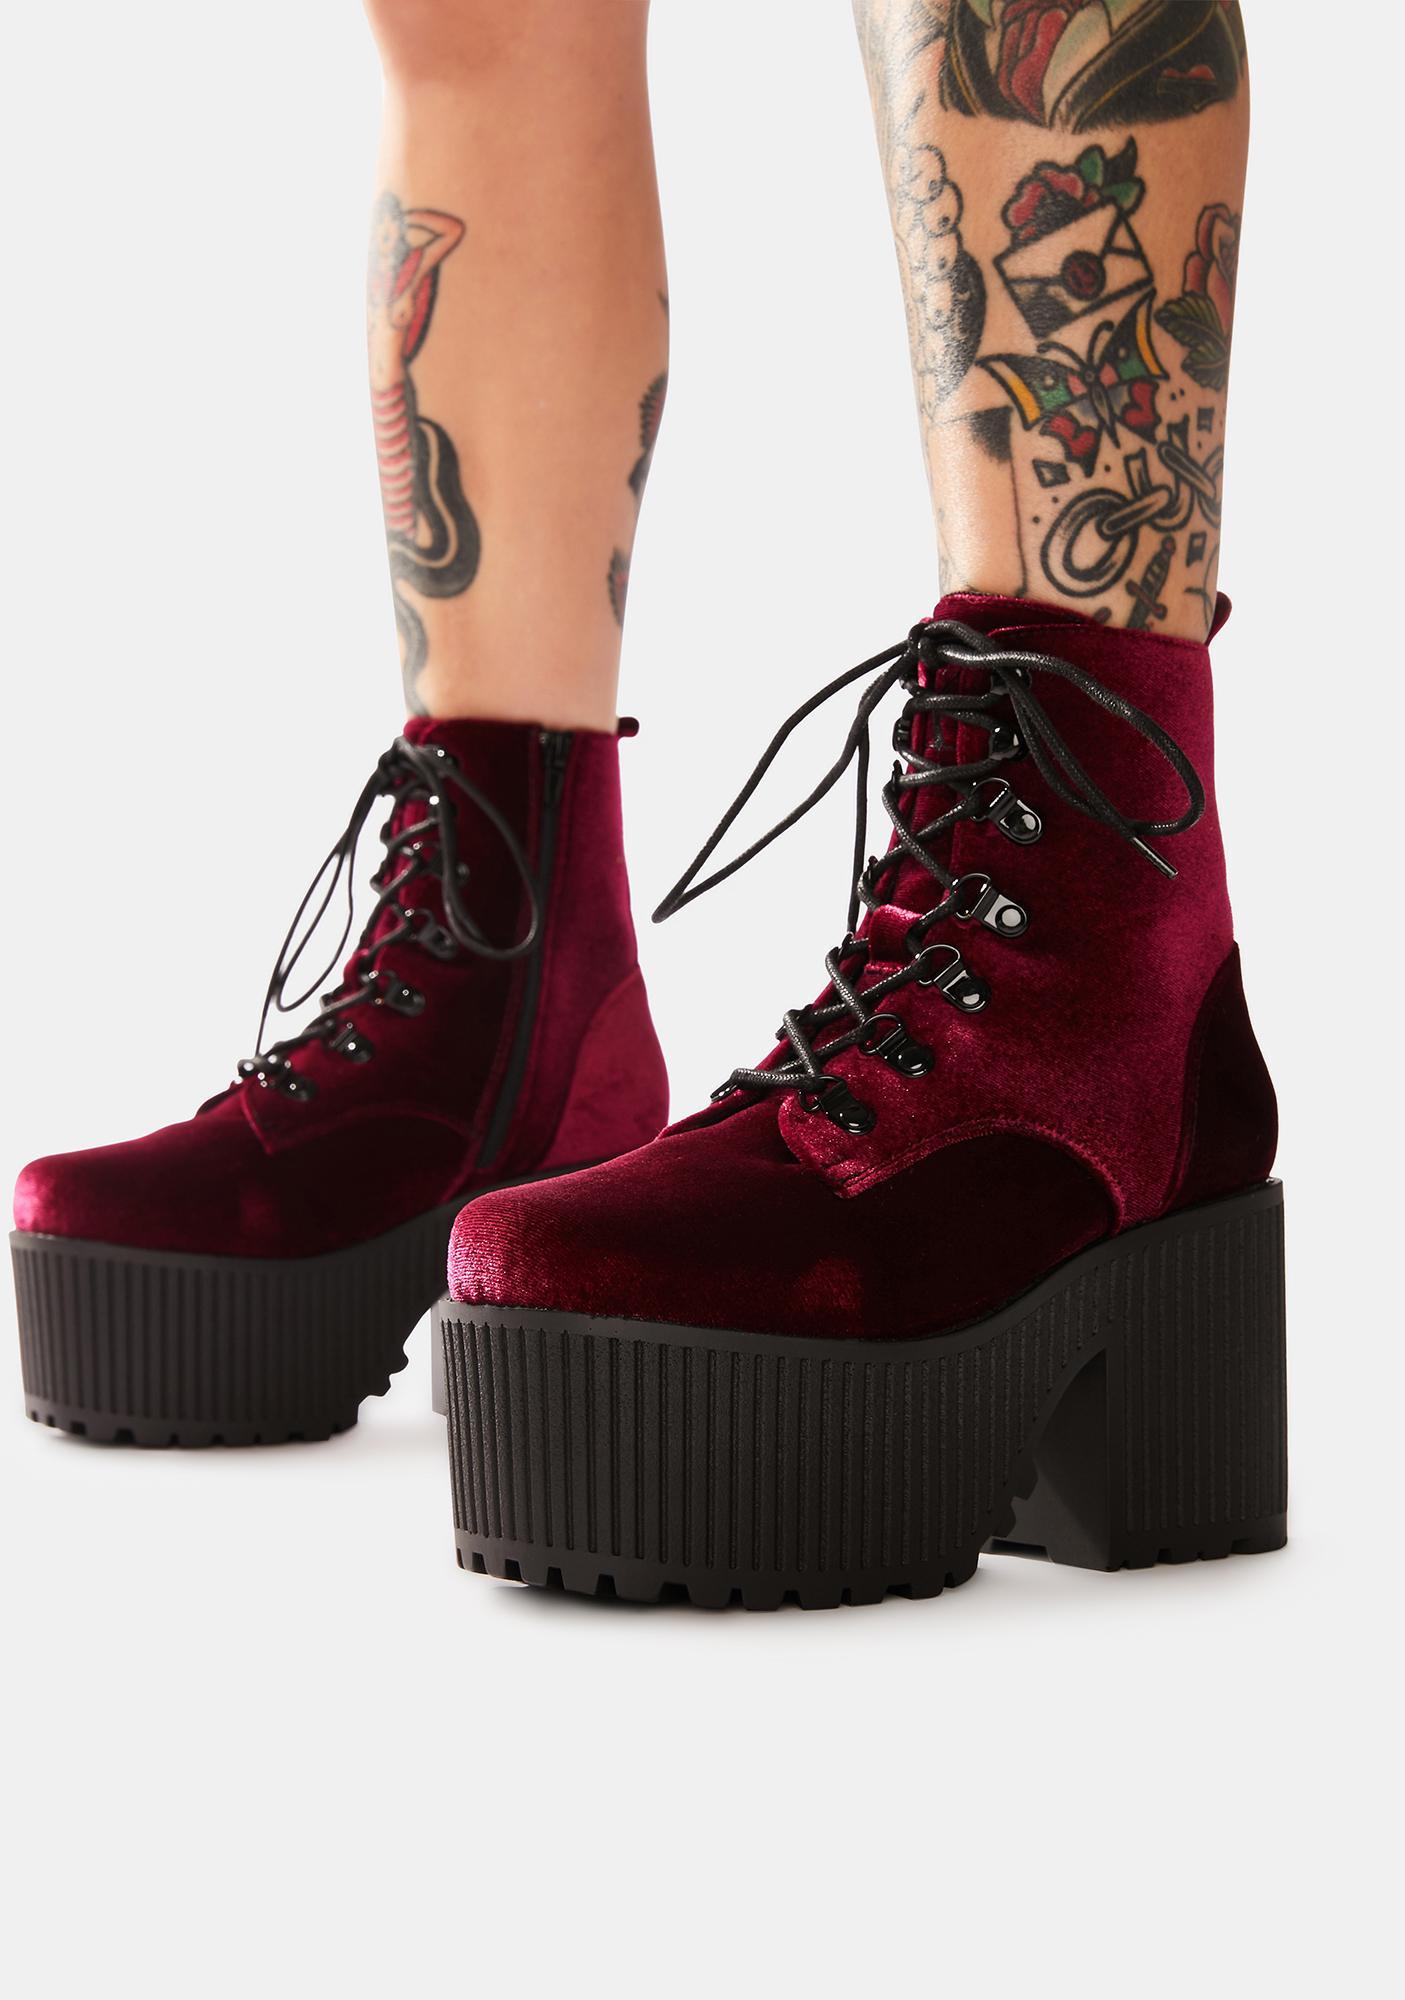 Y.R.U. Creep Burgundy Velvet Platform Boots